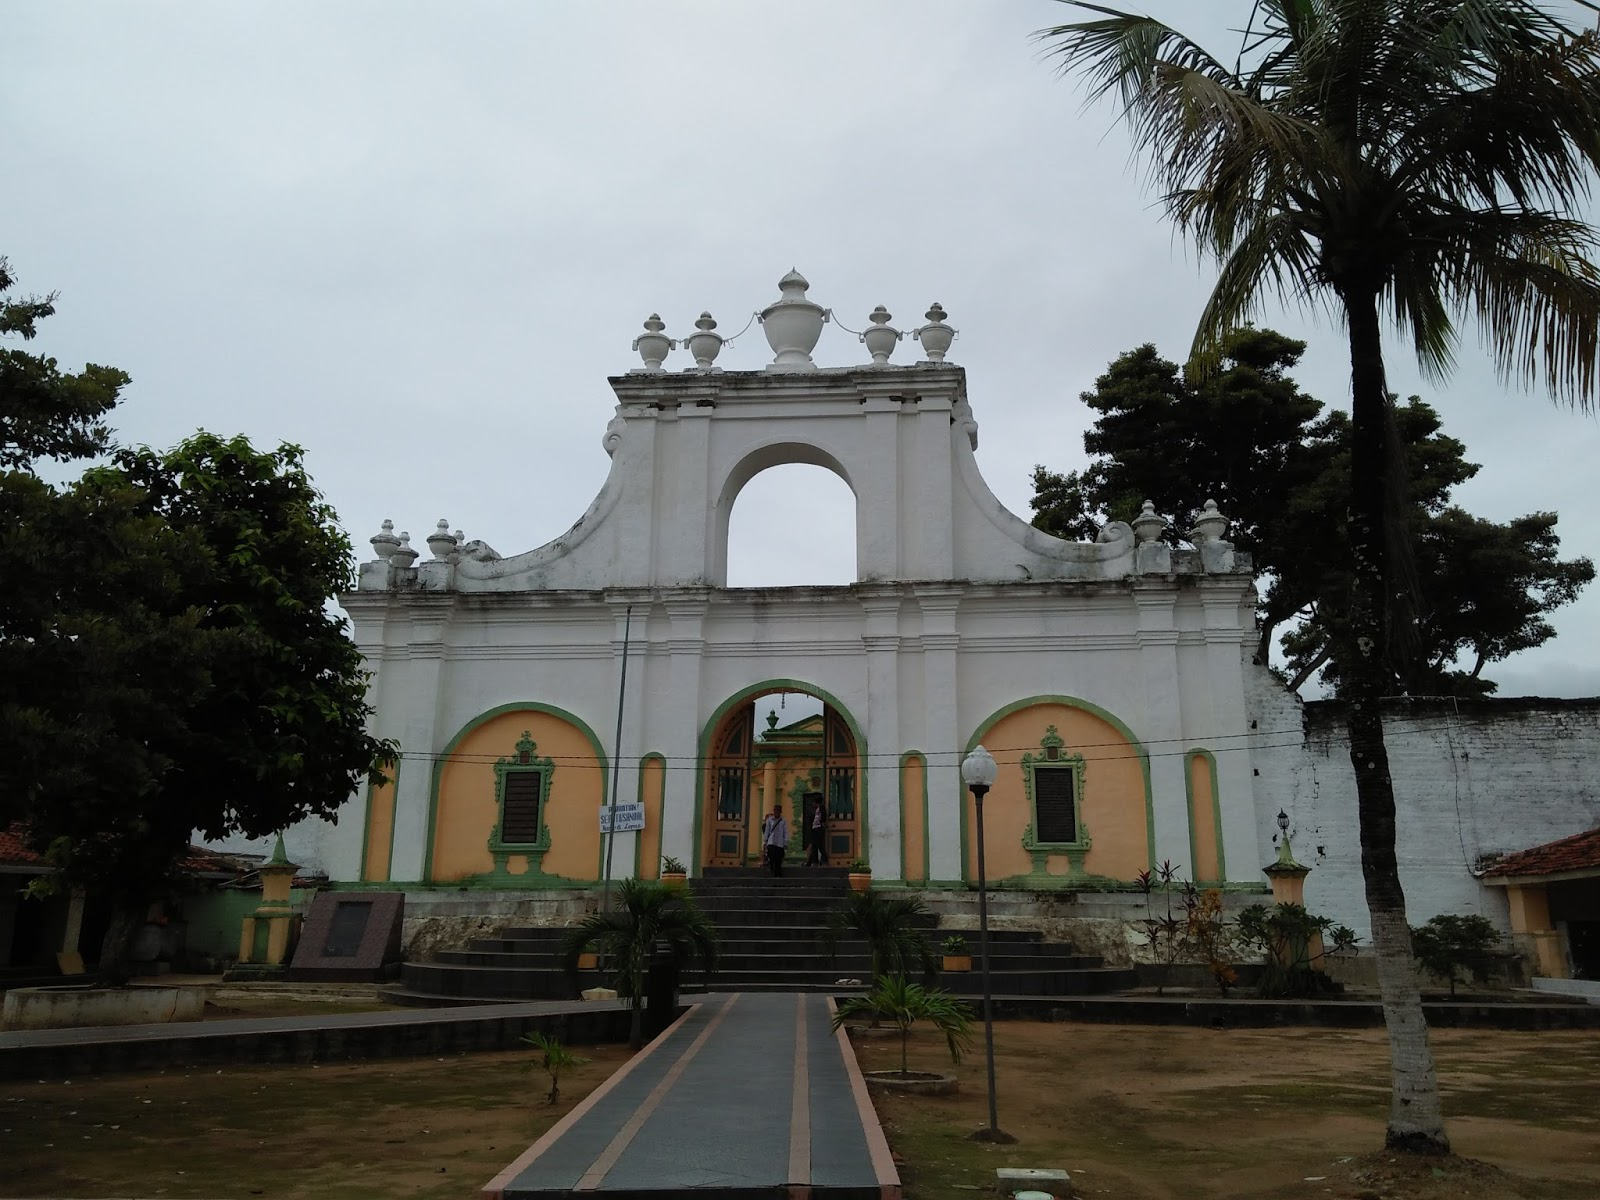 Wisata Religi Asta Tinggi Sumenep Smp Negeri 1 Makam Raja